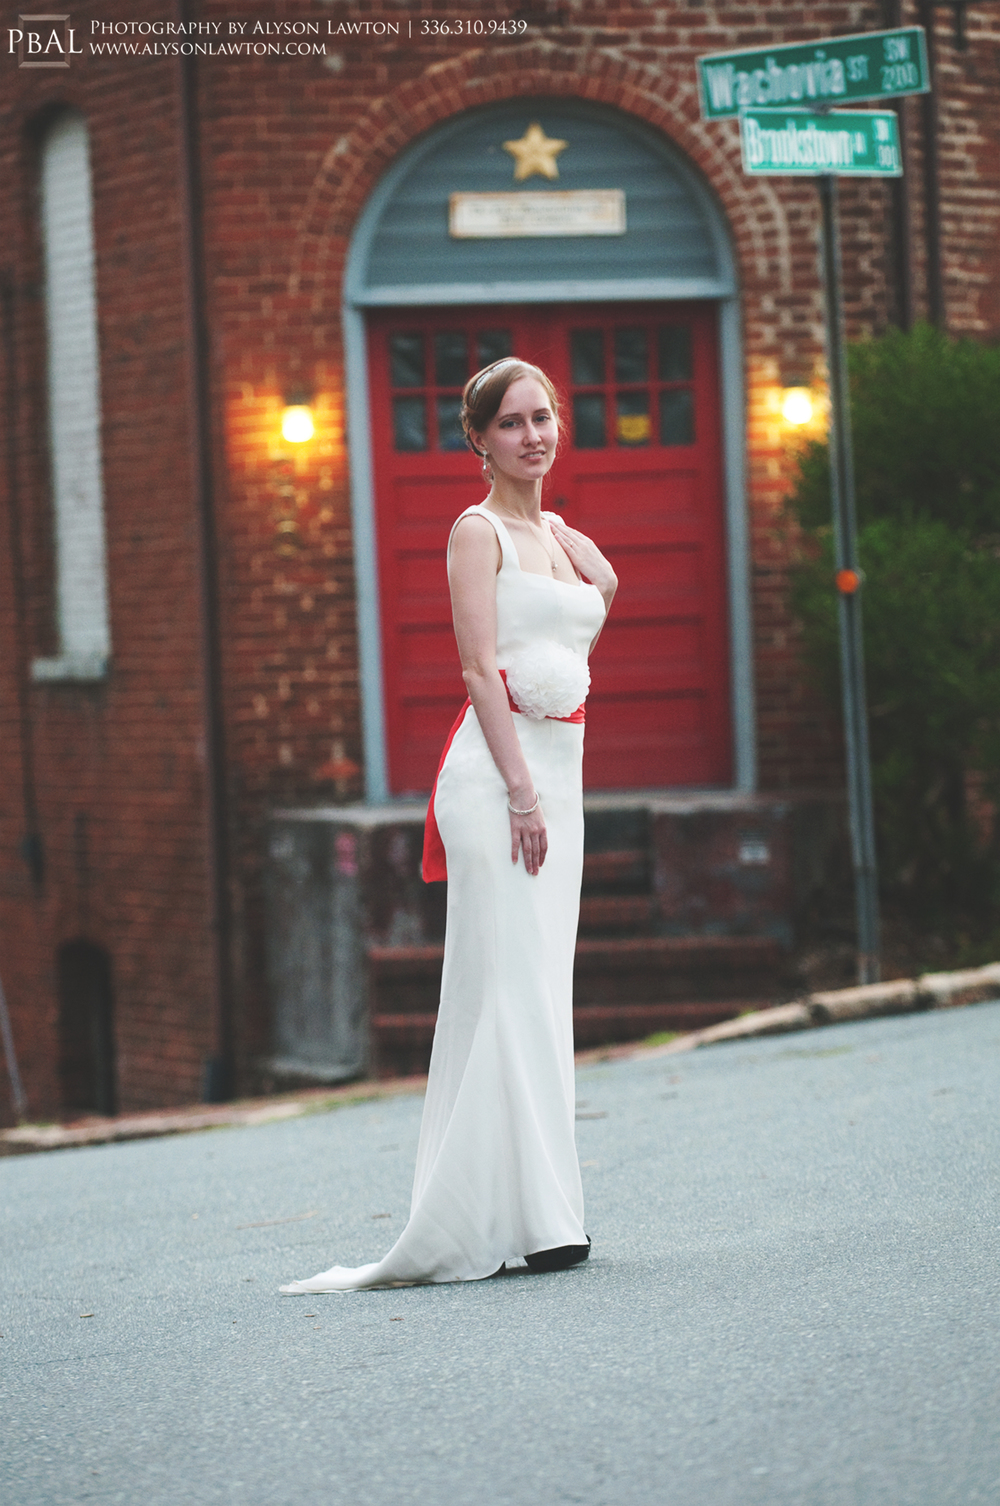 Winston-Salem Bridal Portrait Photographer | Piedmont Triad Portrait Photography | Brookstown Inn | Photography by Alyson Lawton